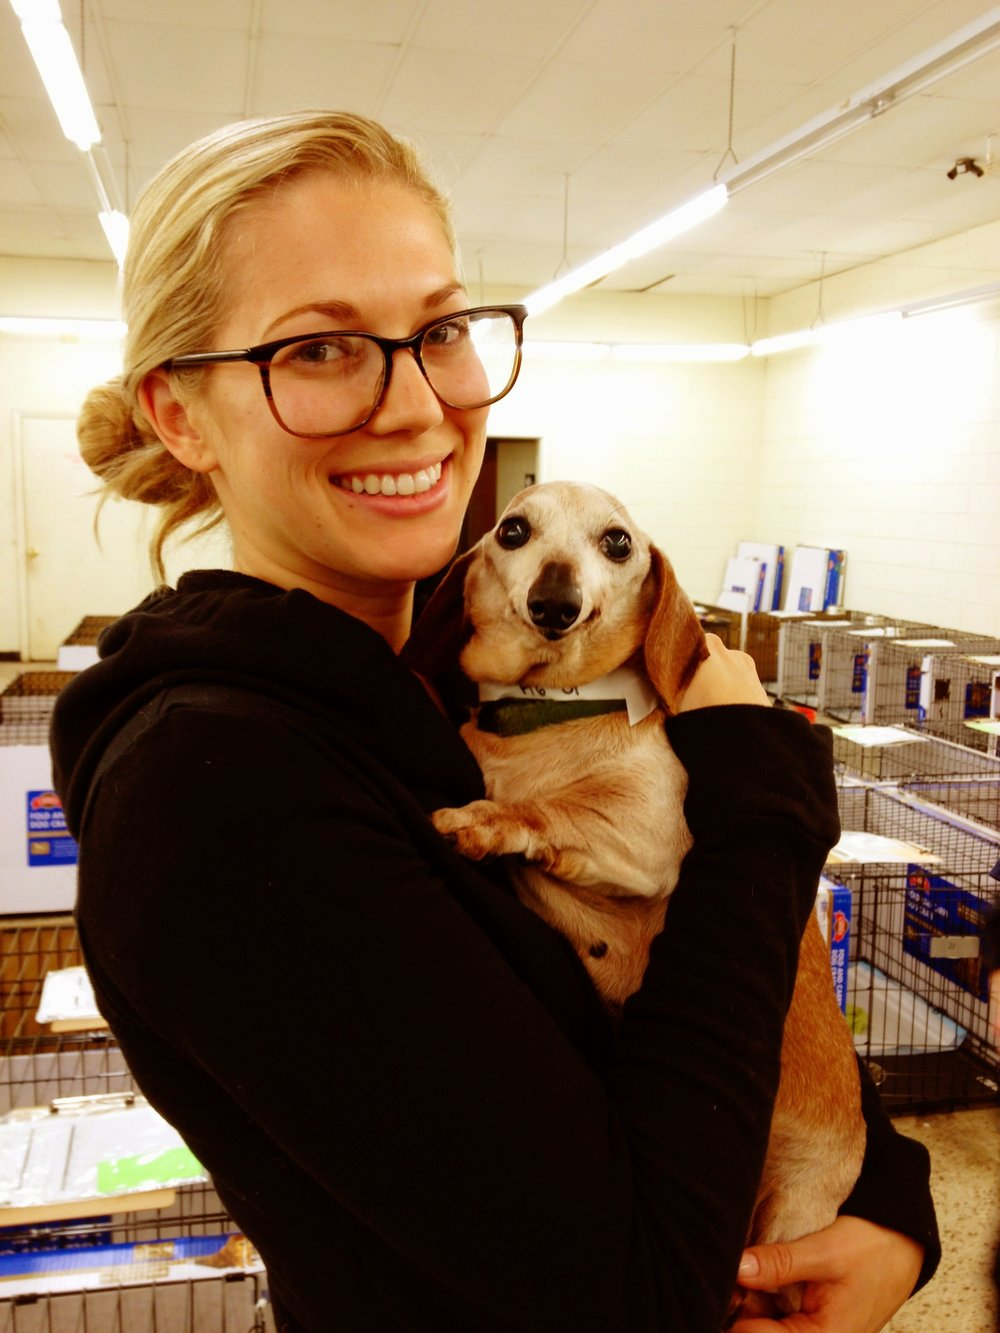 Breanna at puppy mill raid with an adorable dachshund